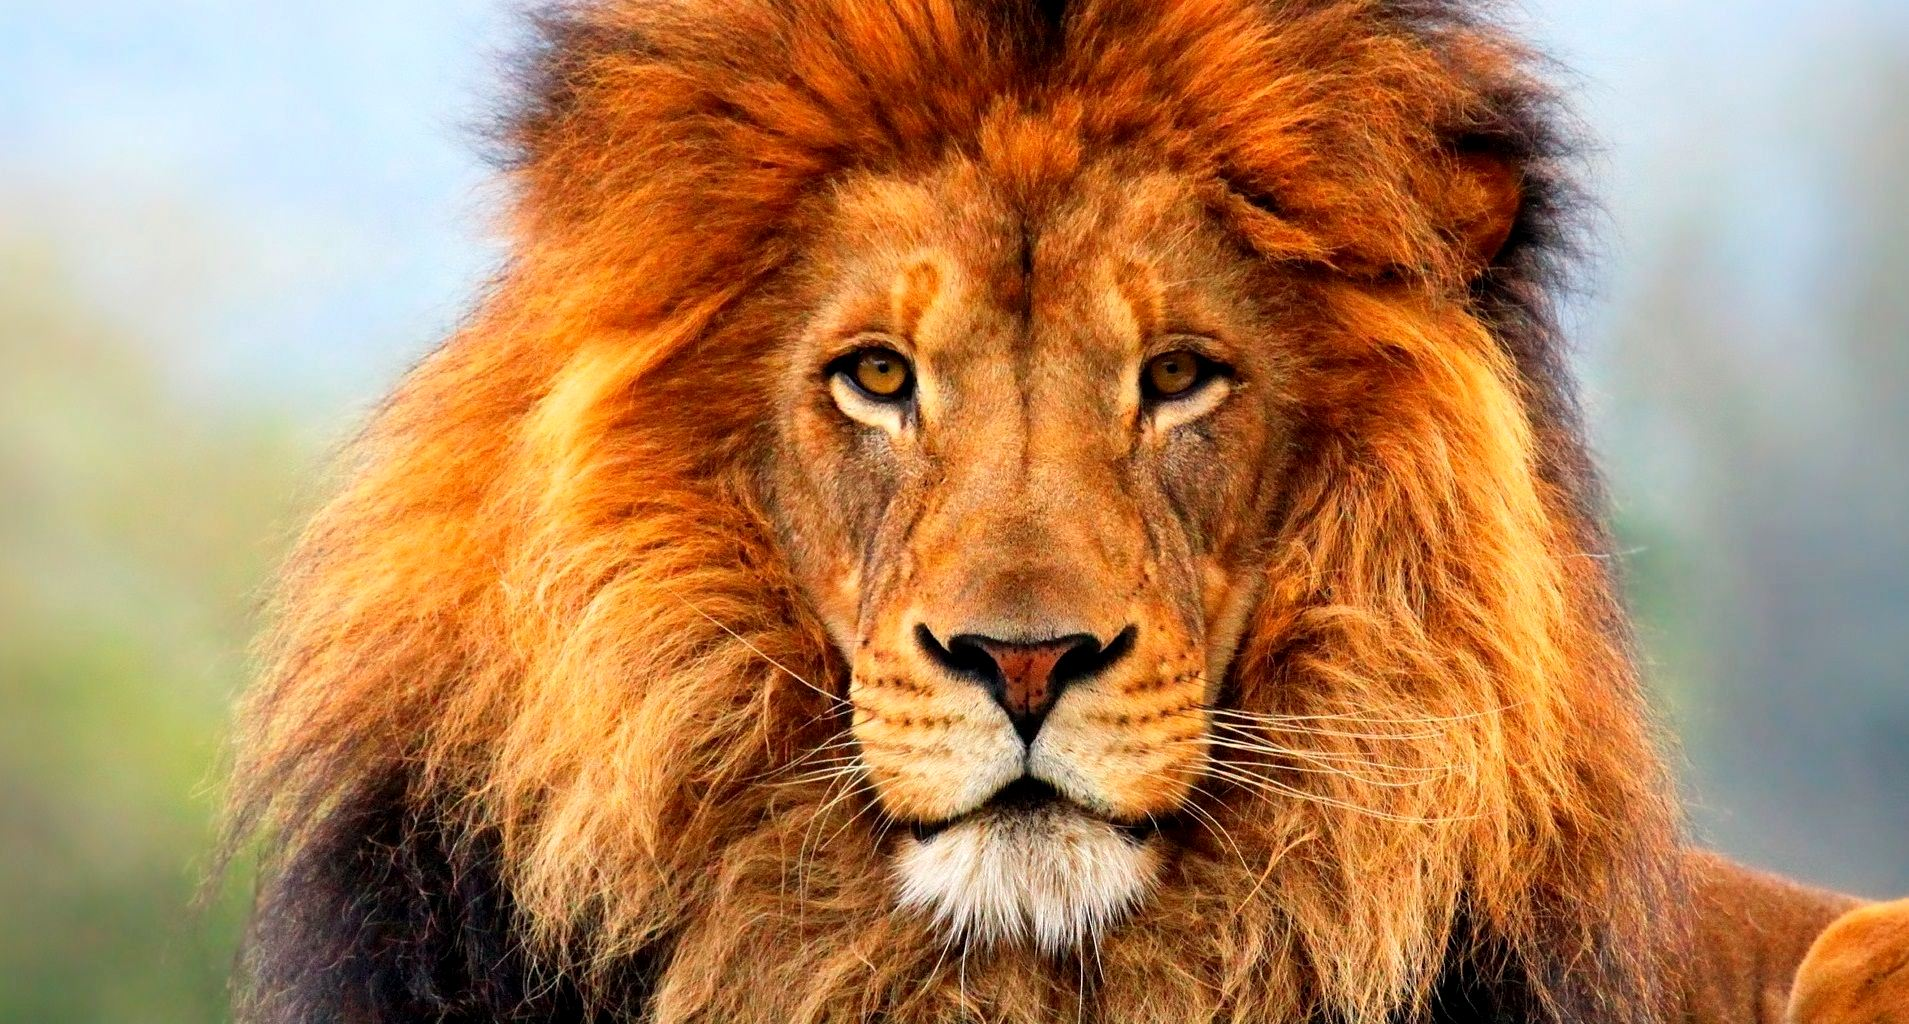 10 Most Popular Wild Animals Wallpapers Free Download Full: HD Animals Wallpaper